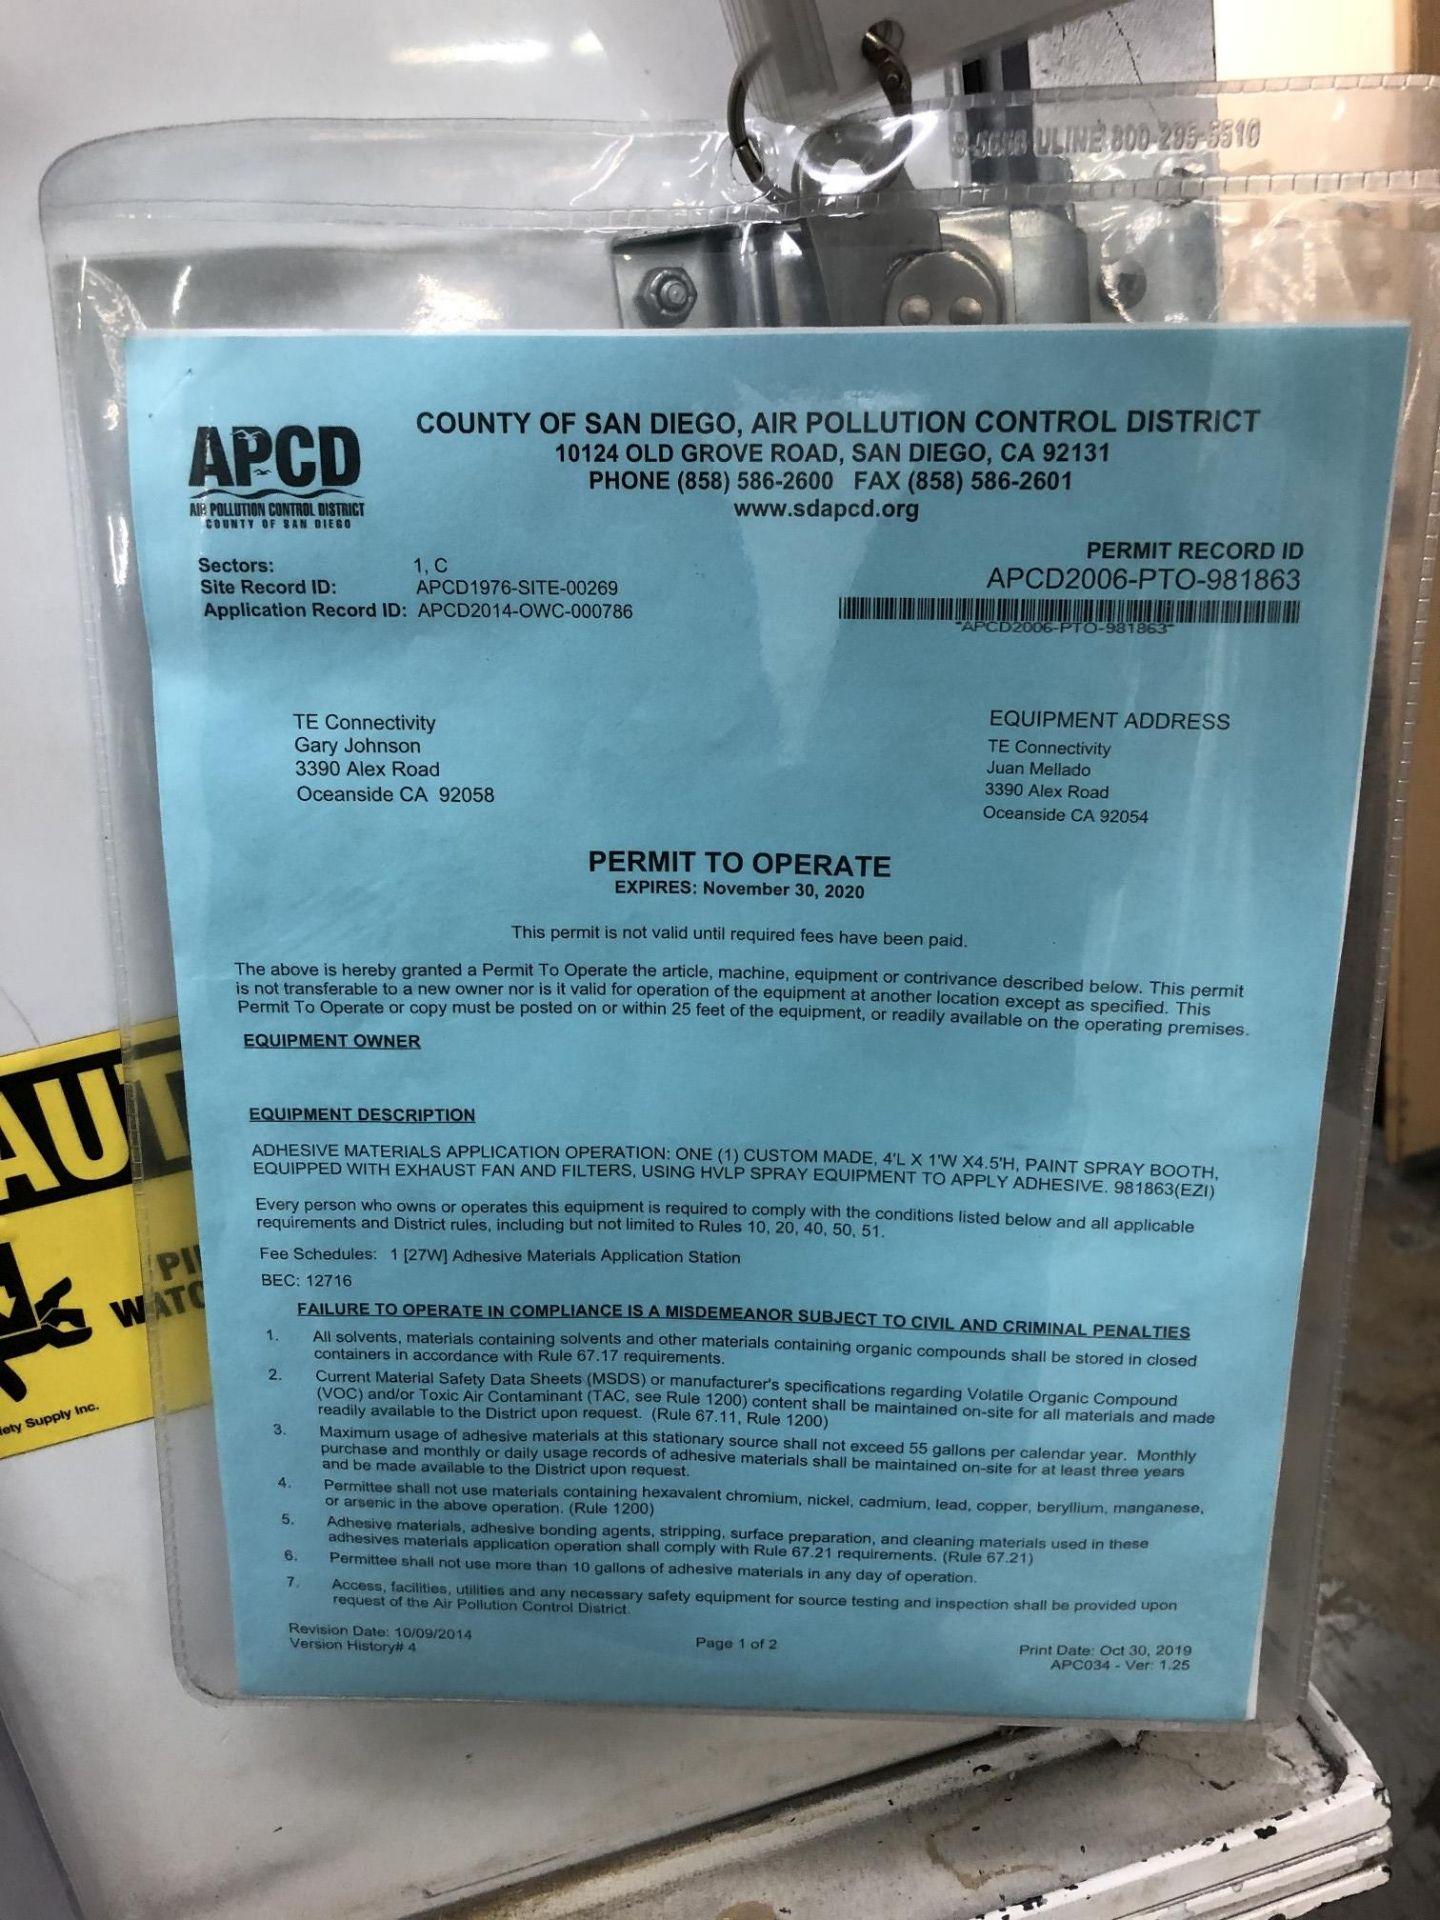 Adhesive Spray Booth (Custom Made) - Image 6 of 9